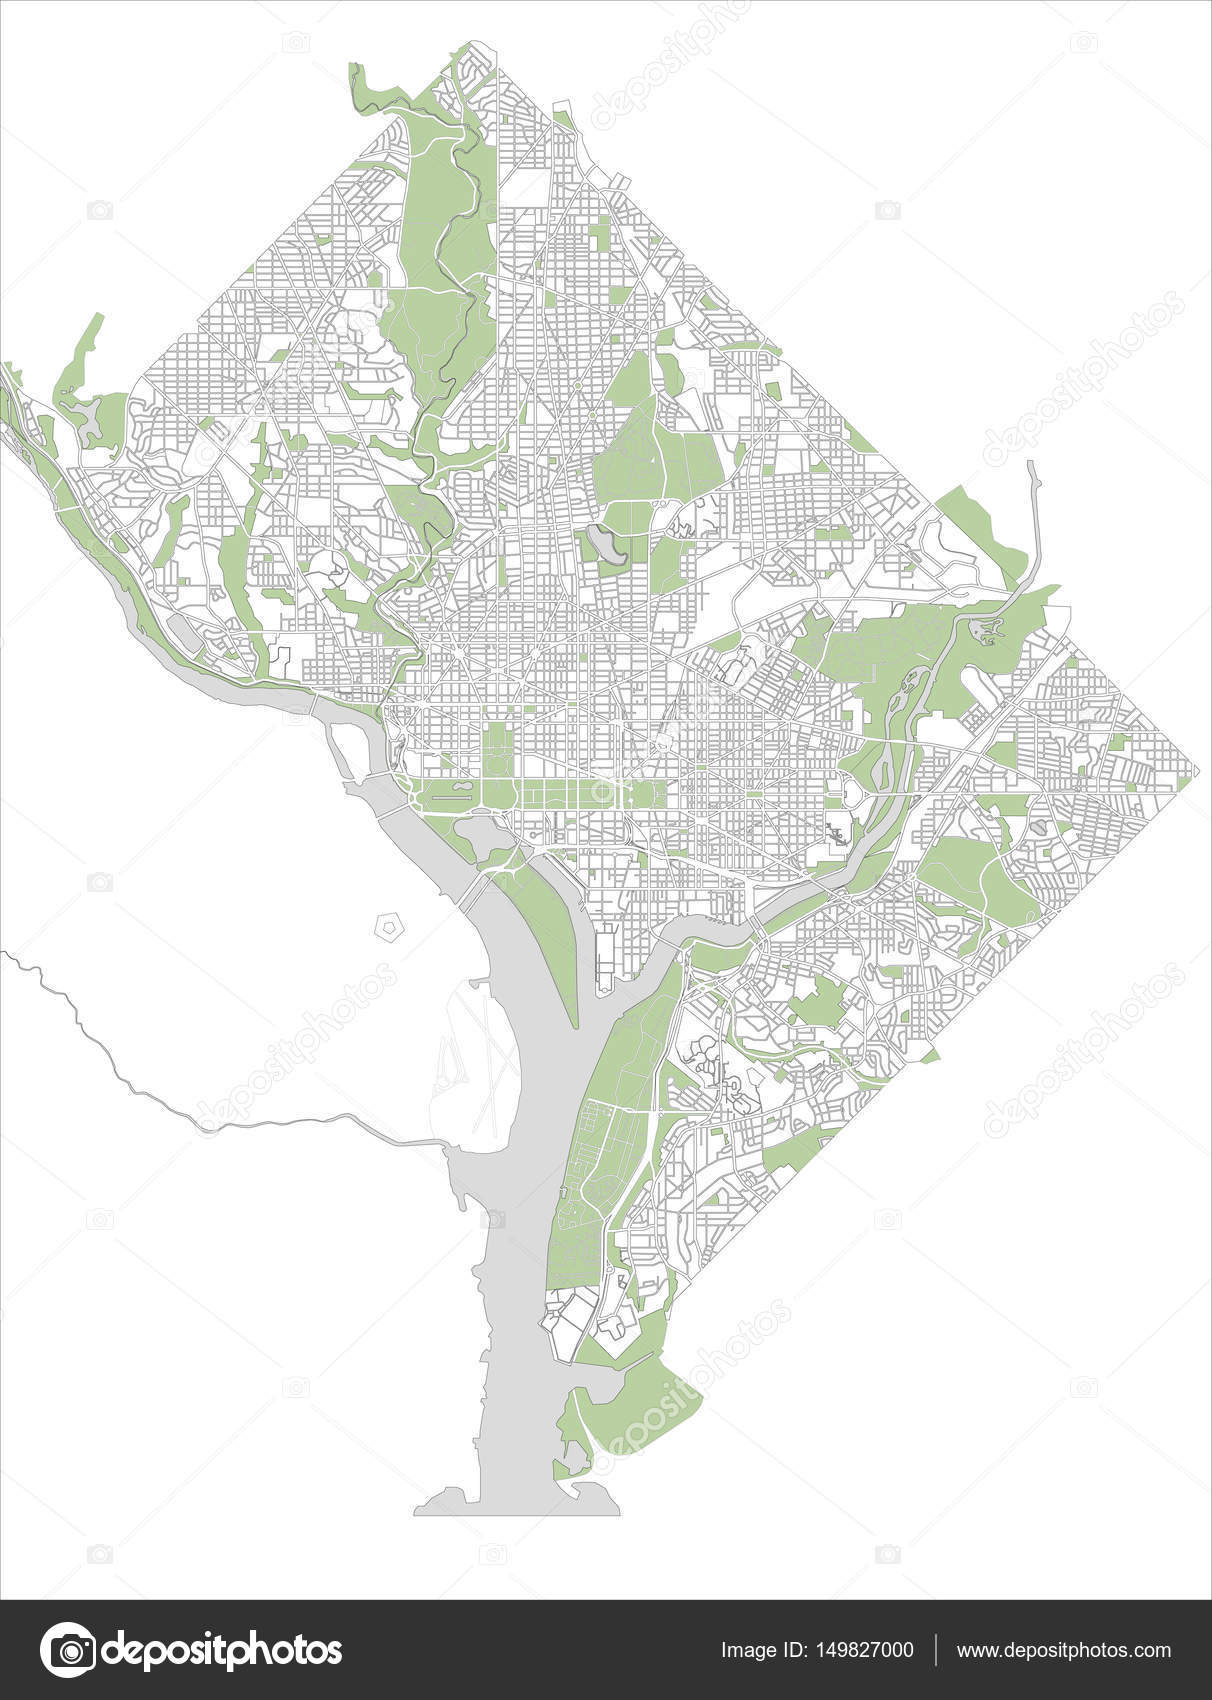 Washington Dc Karte.Karte Der Stadt Washington D C Usa Stockfoto Tish11 149827000